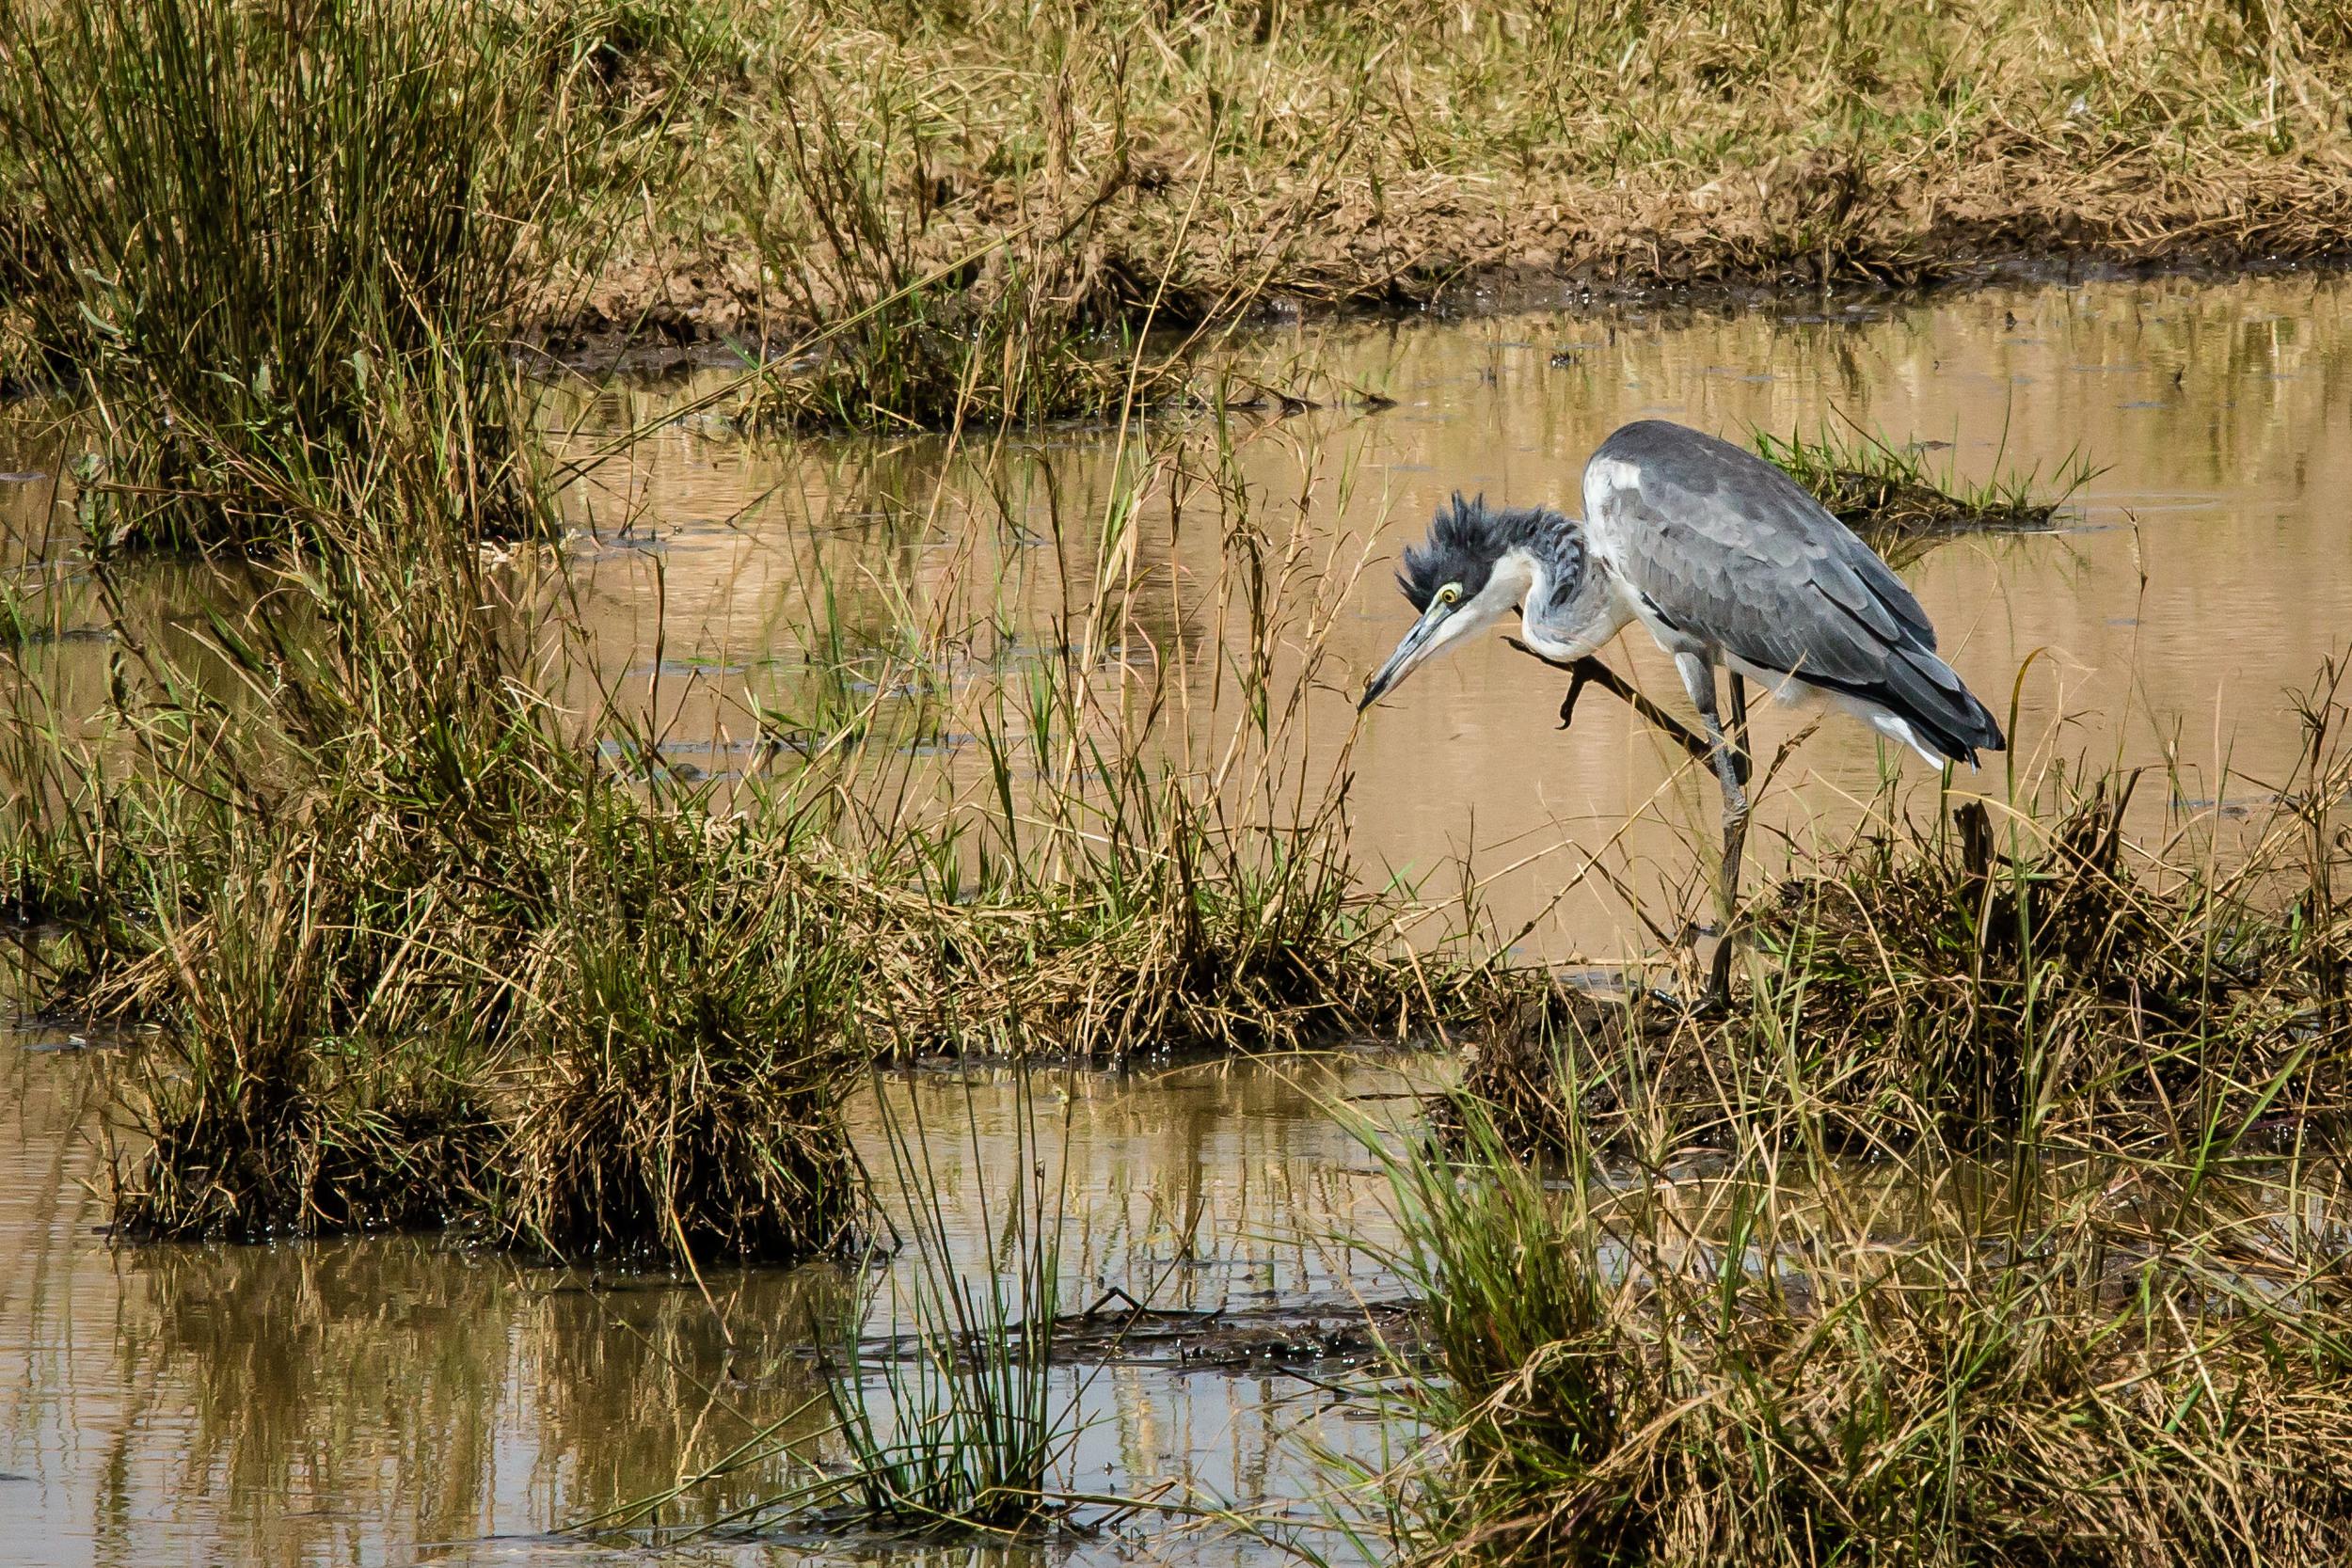 Blue Heron on the Masai Mara